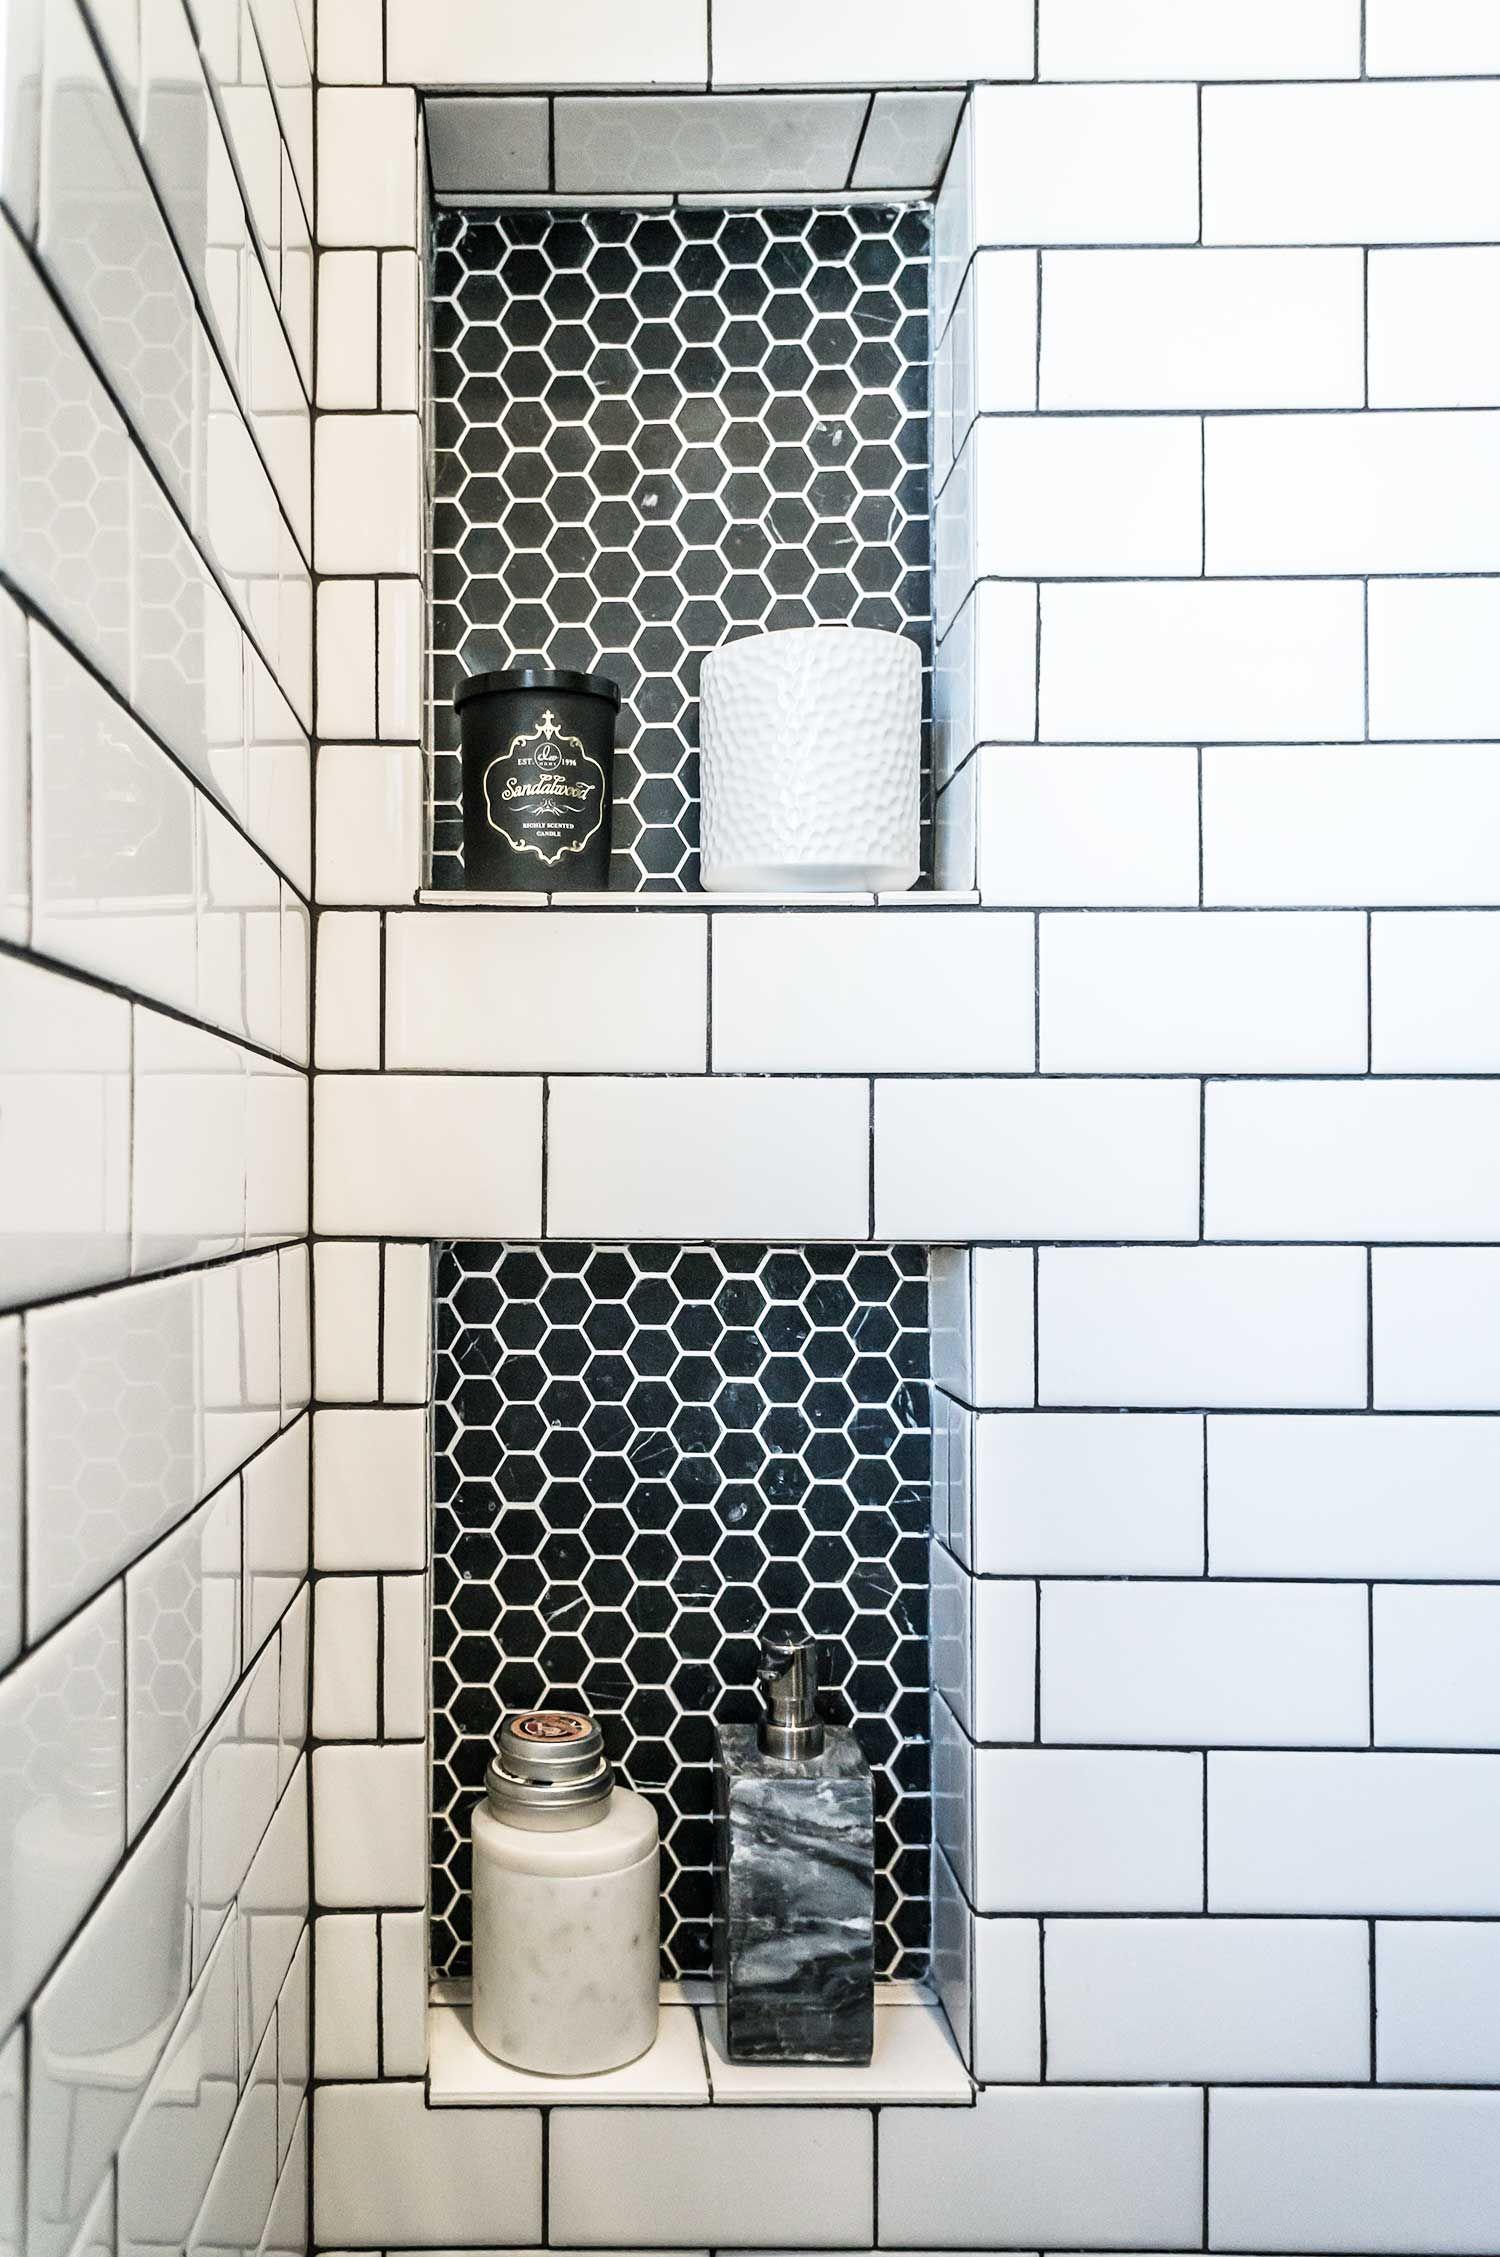 Pin by Tiina Suvanto on Interior | Pinterest | Bath, Bathroom ...